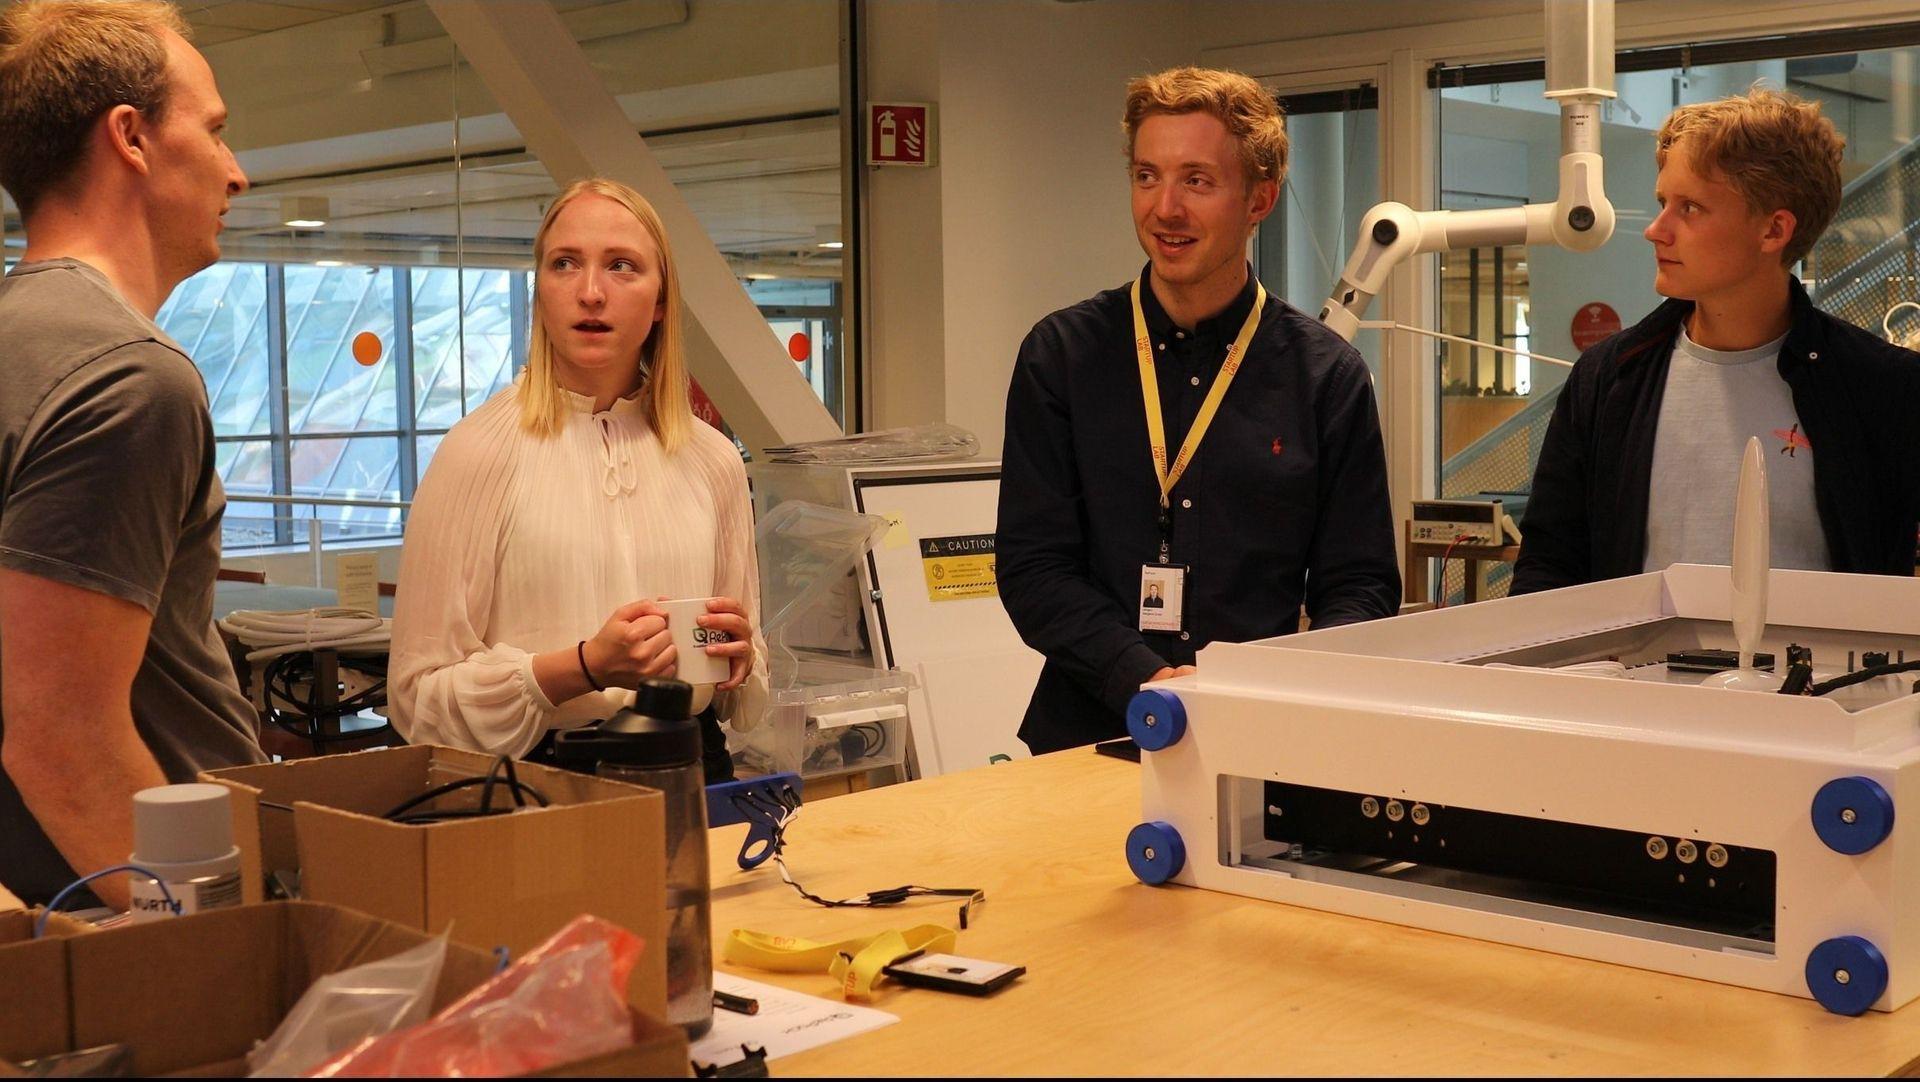 Opplading: Herman Hille, Jørgen Erdal og Jens Kristoffersen fra RePack i prat med Accentures intern Marthe Linnerud.